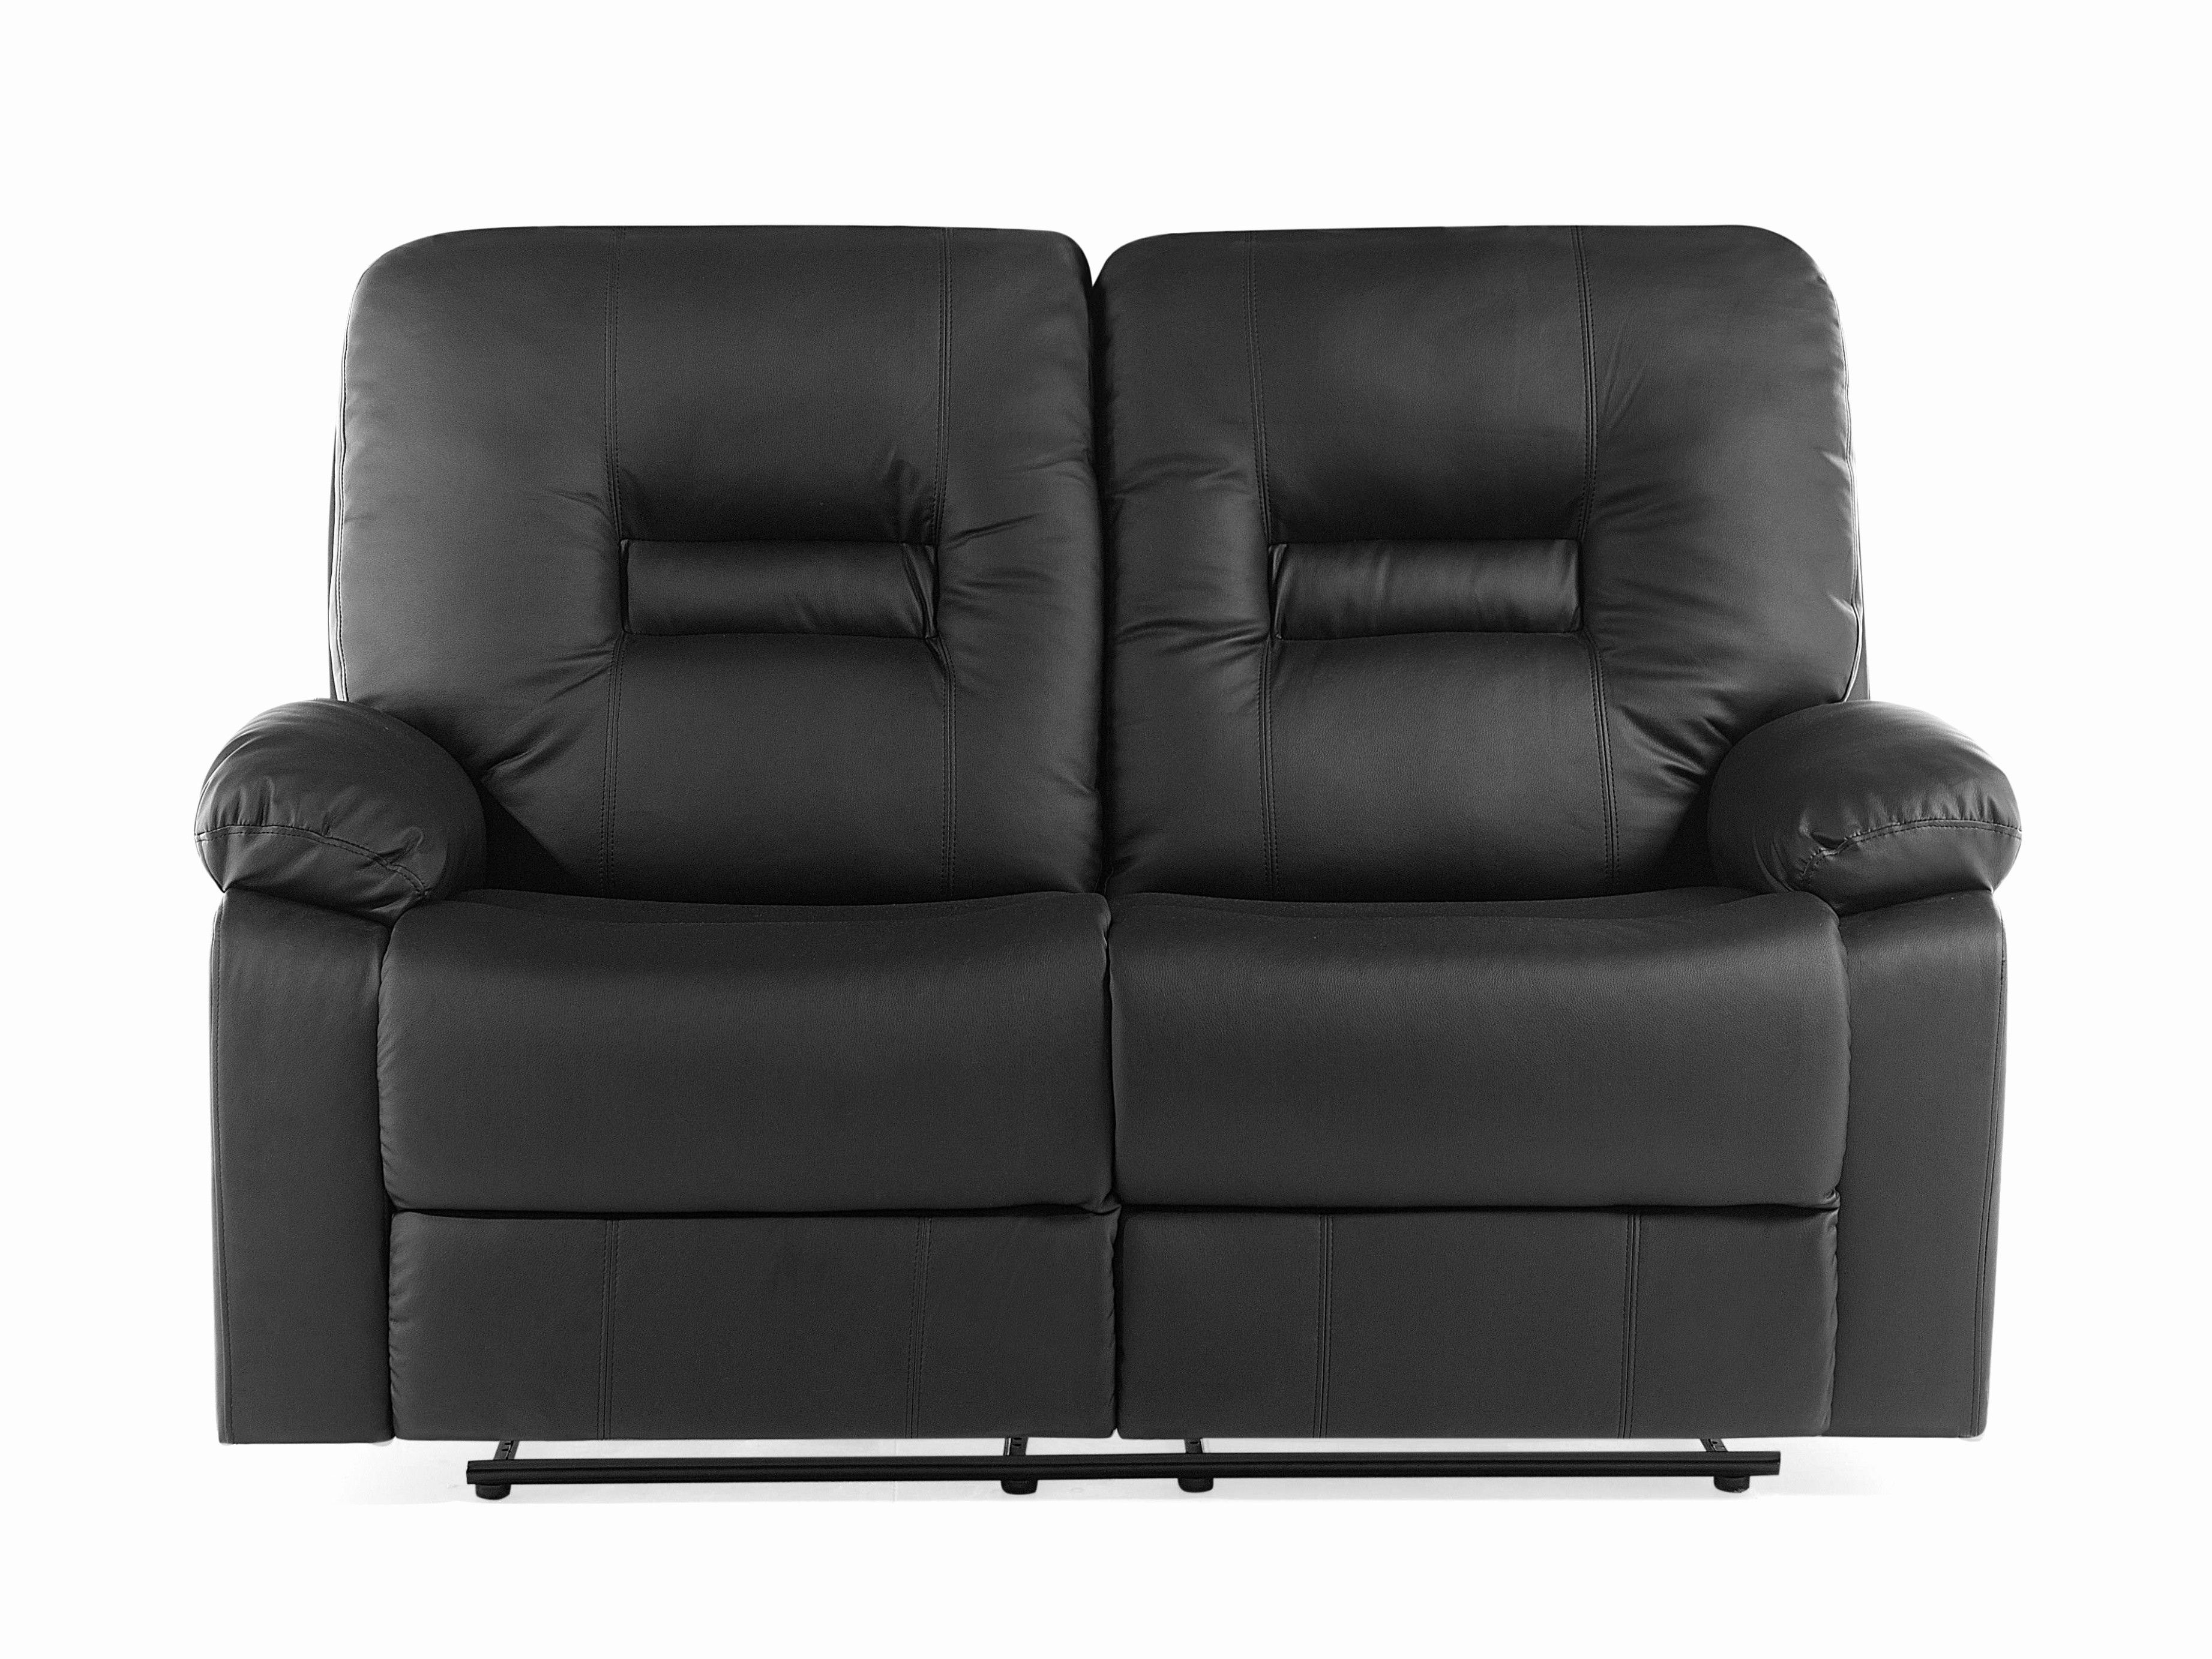 Schlafsofa 120 Cm Breit Elegant Schlafsofa 120 Cm Breit Einzigartig Sofa 200 Cm Breit